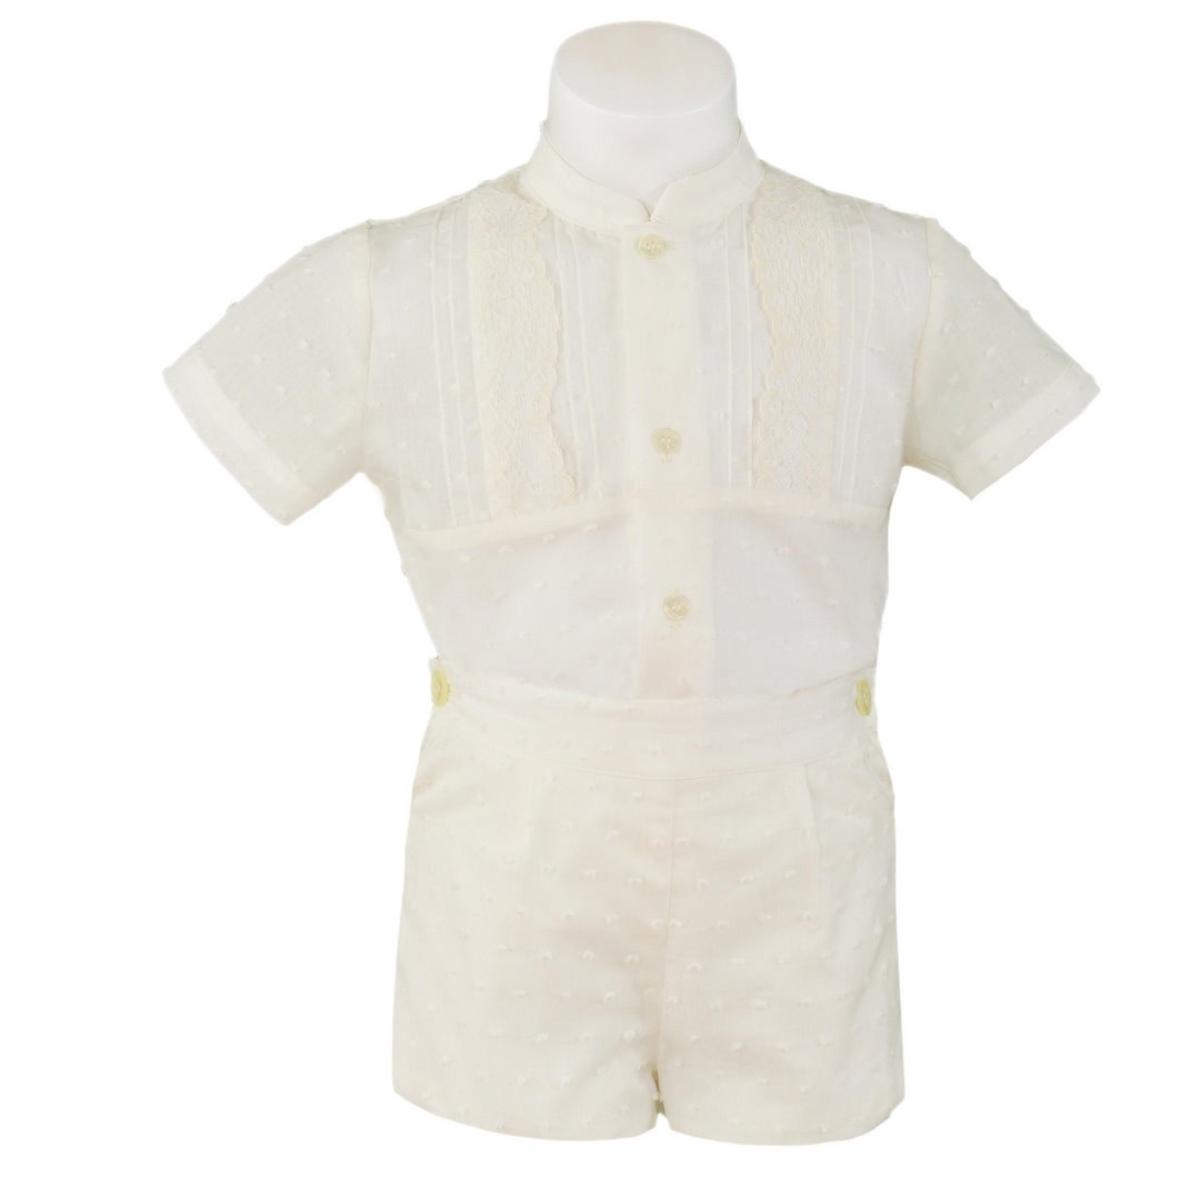 22c62cc51 Conjunto bebe en plumeti con camisa y pantalon corto. Miranda (Ref ...